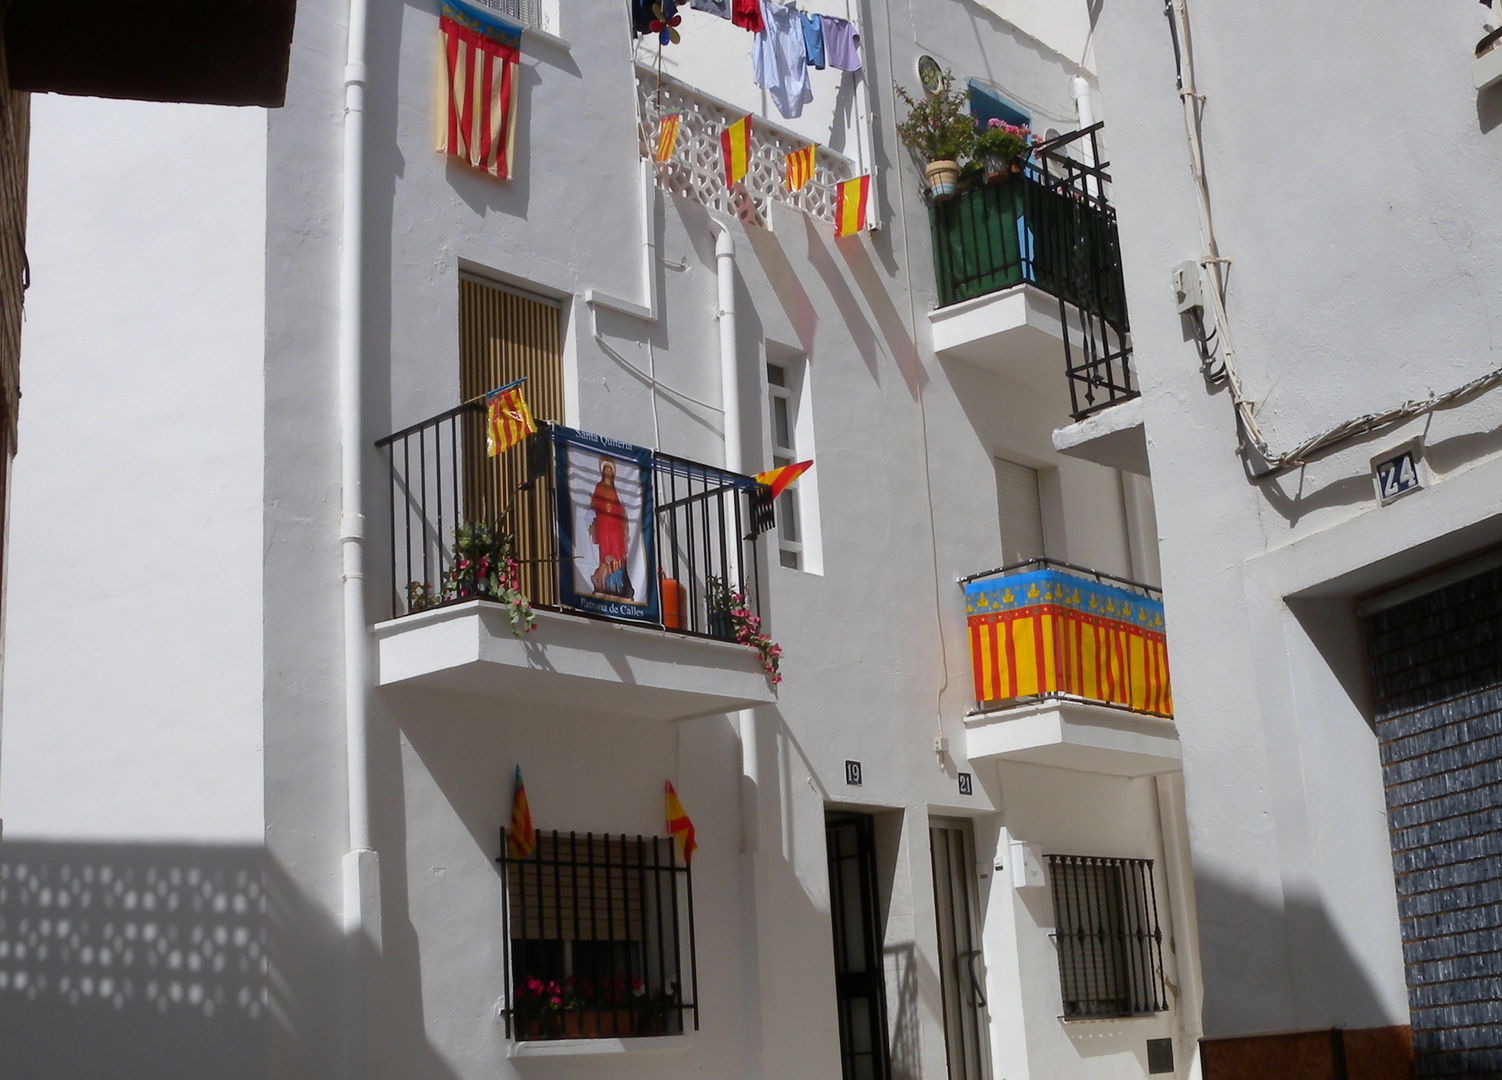 Calles et la fête de Sta. Quiteria..02